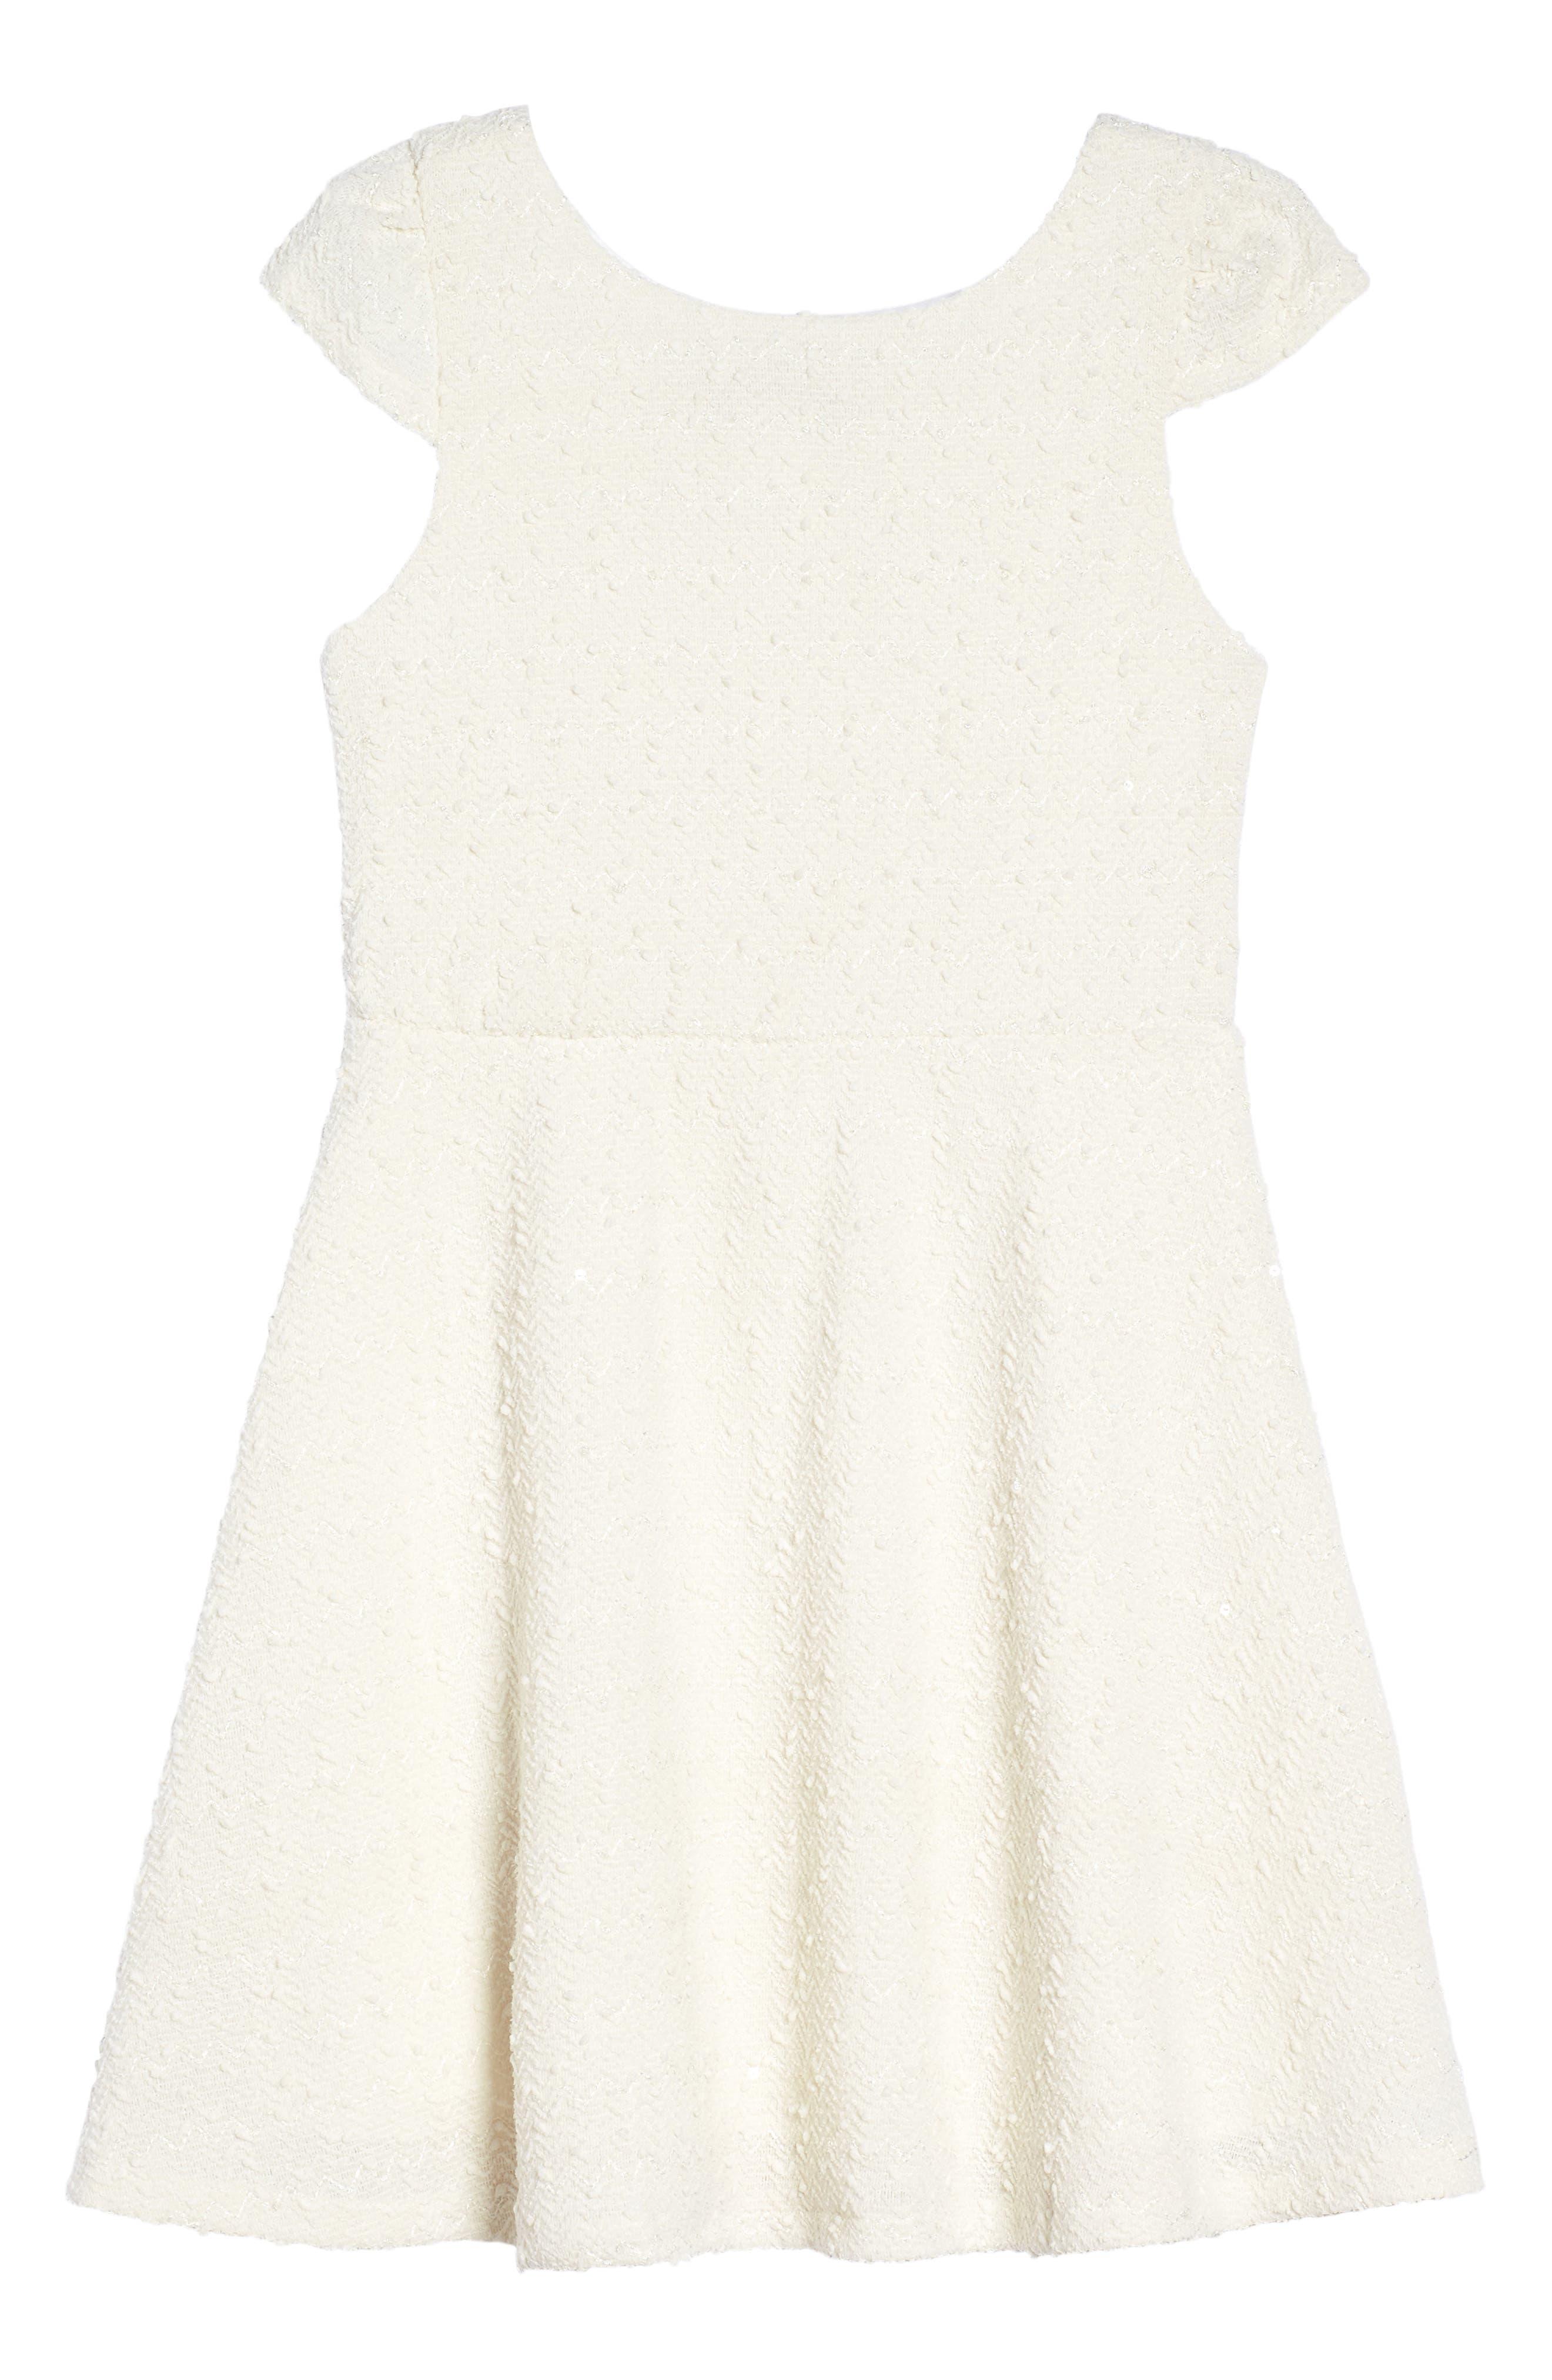 Alternate Image 1 Selected - Dorissa Carly Cap Sleeve Dress (Big Girls)